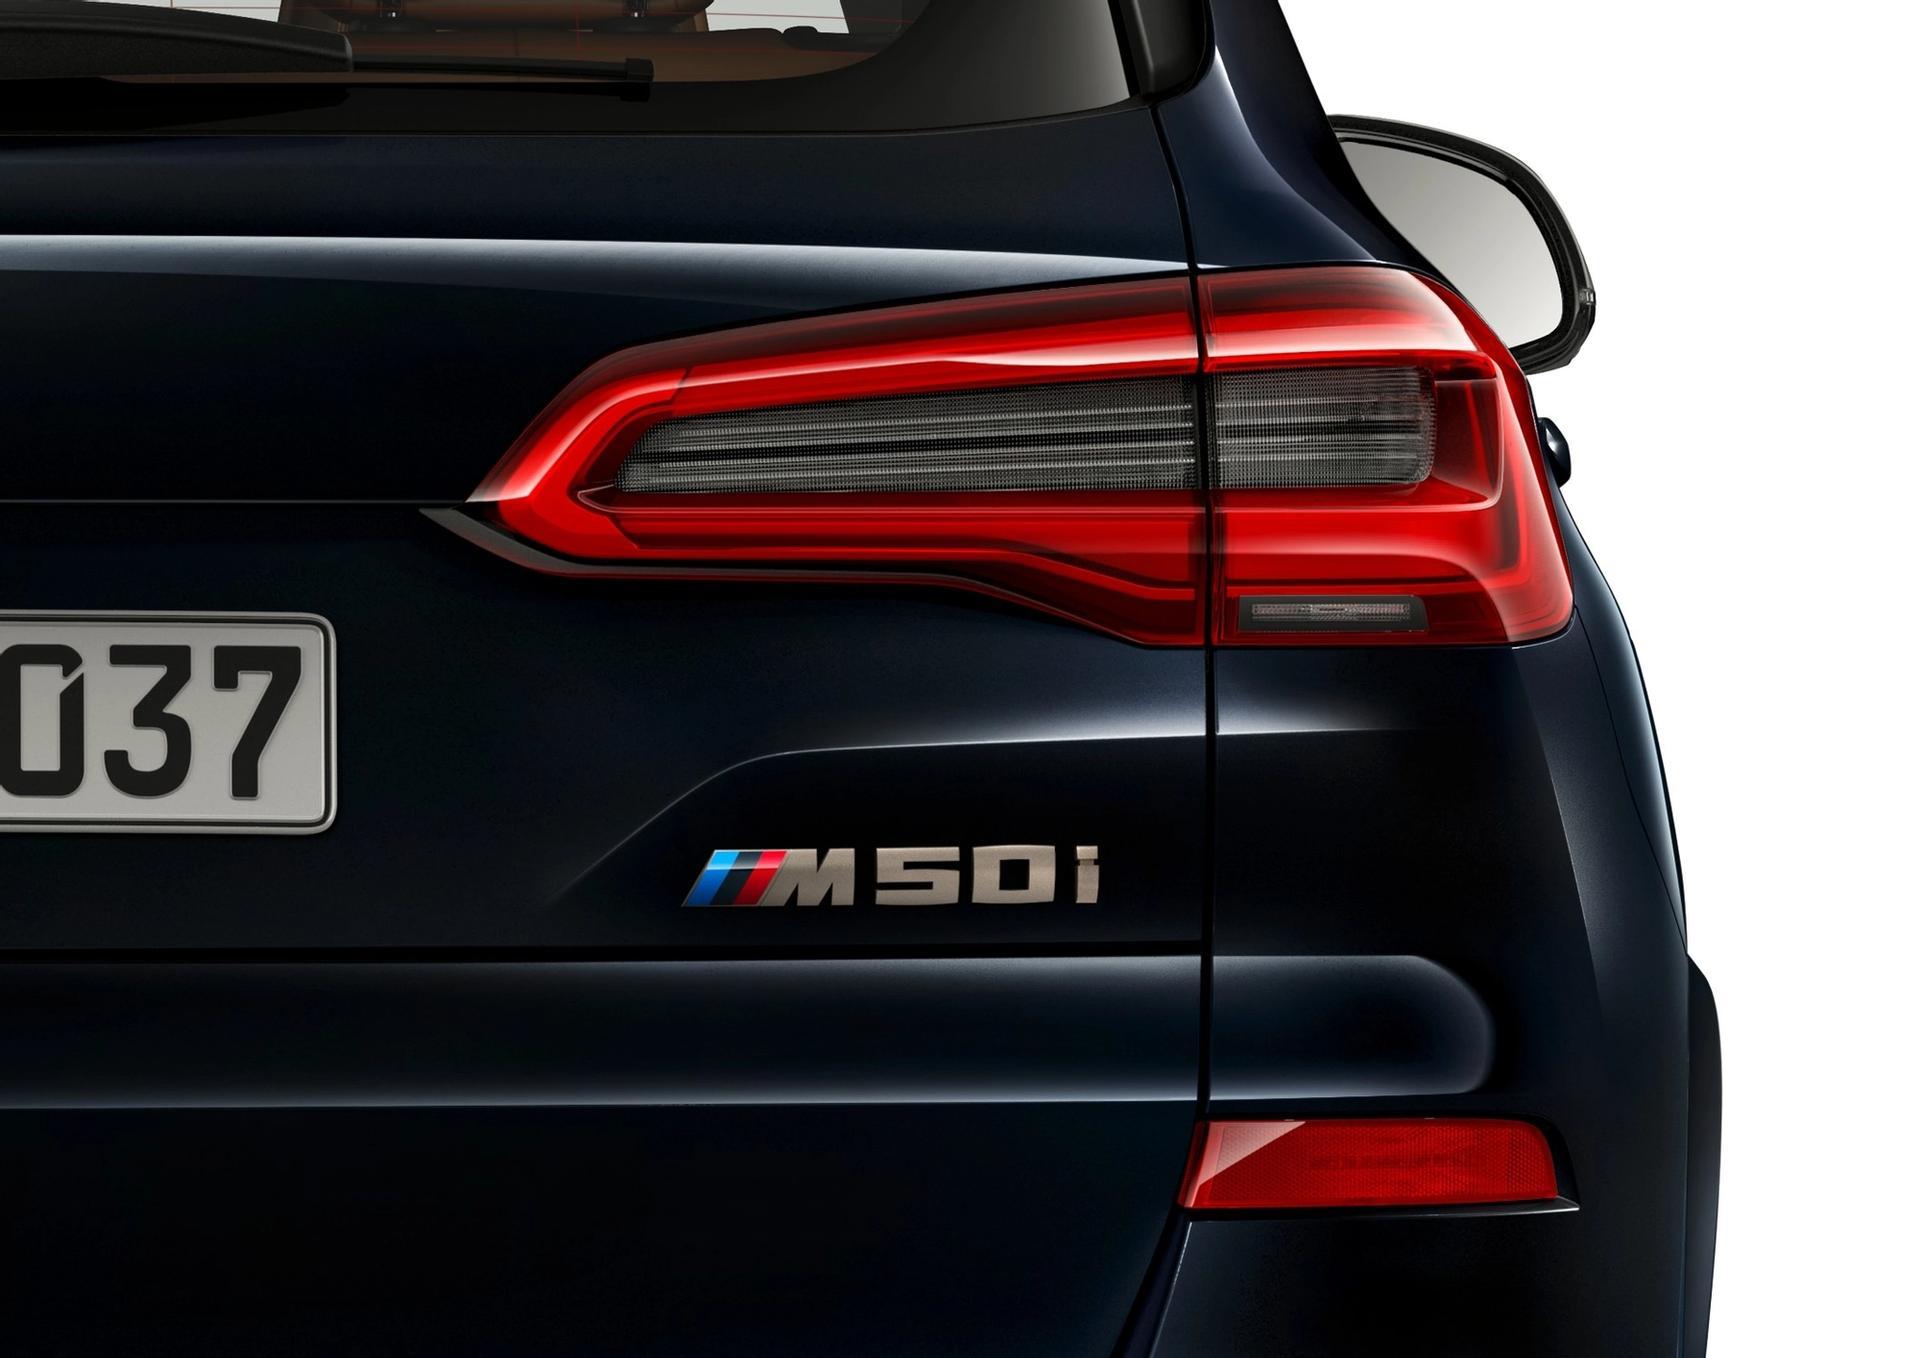 BMW X5 M50i rear taillight